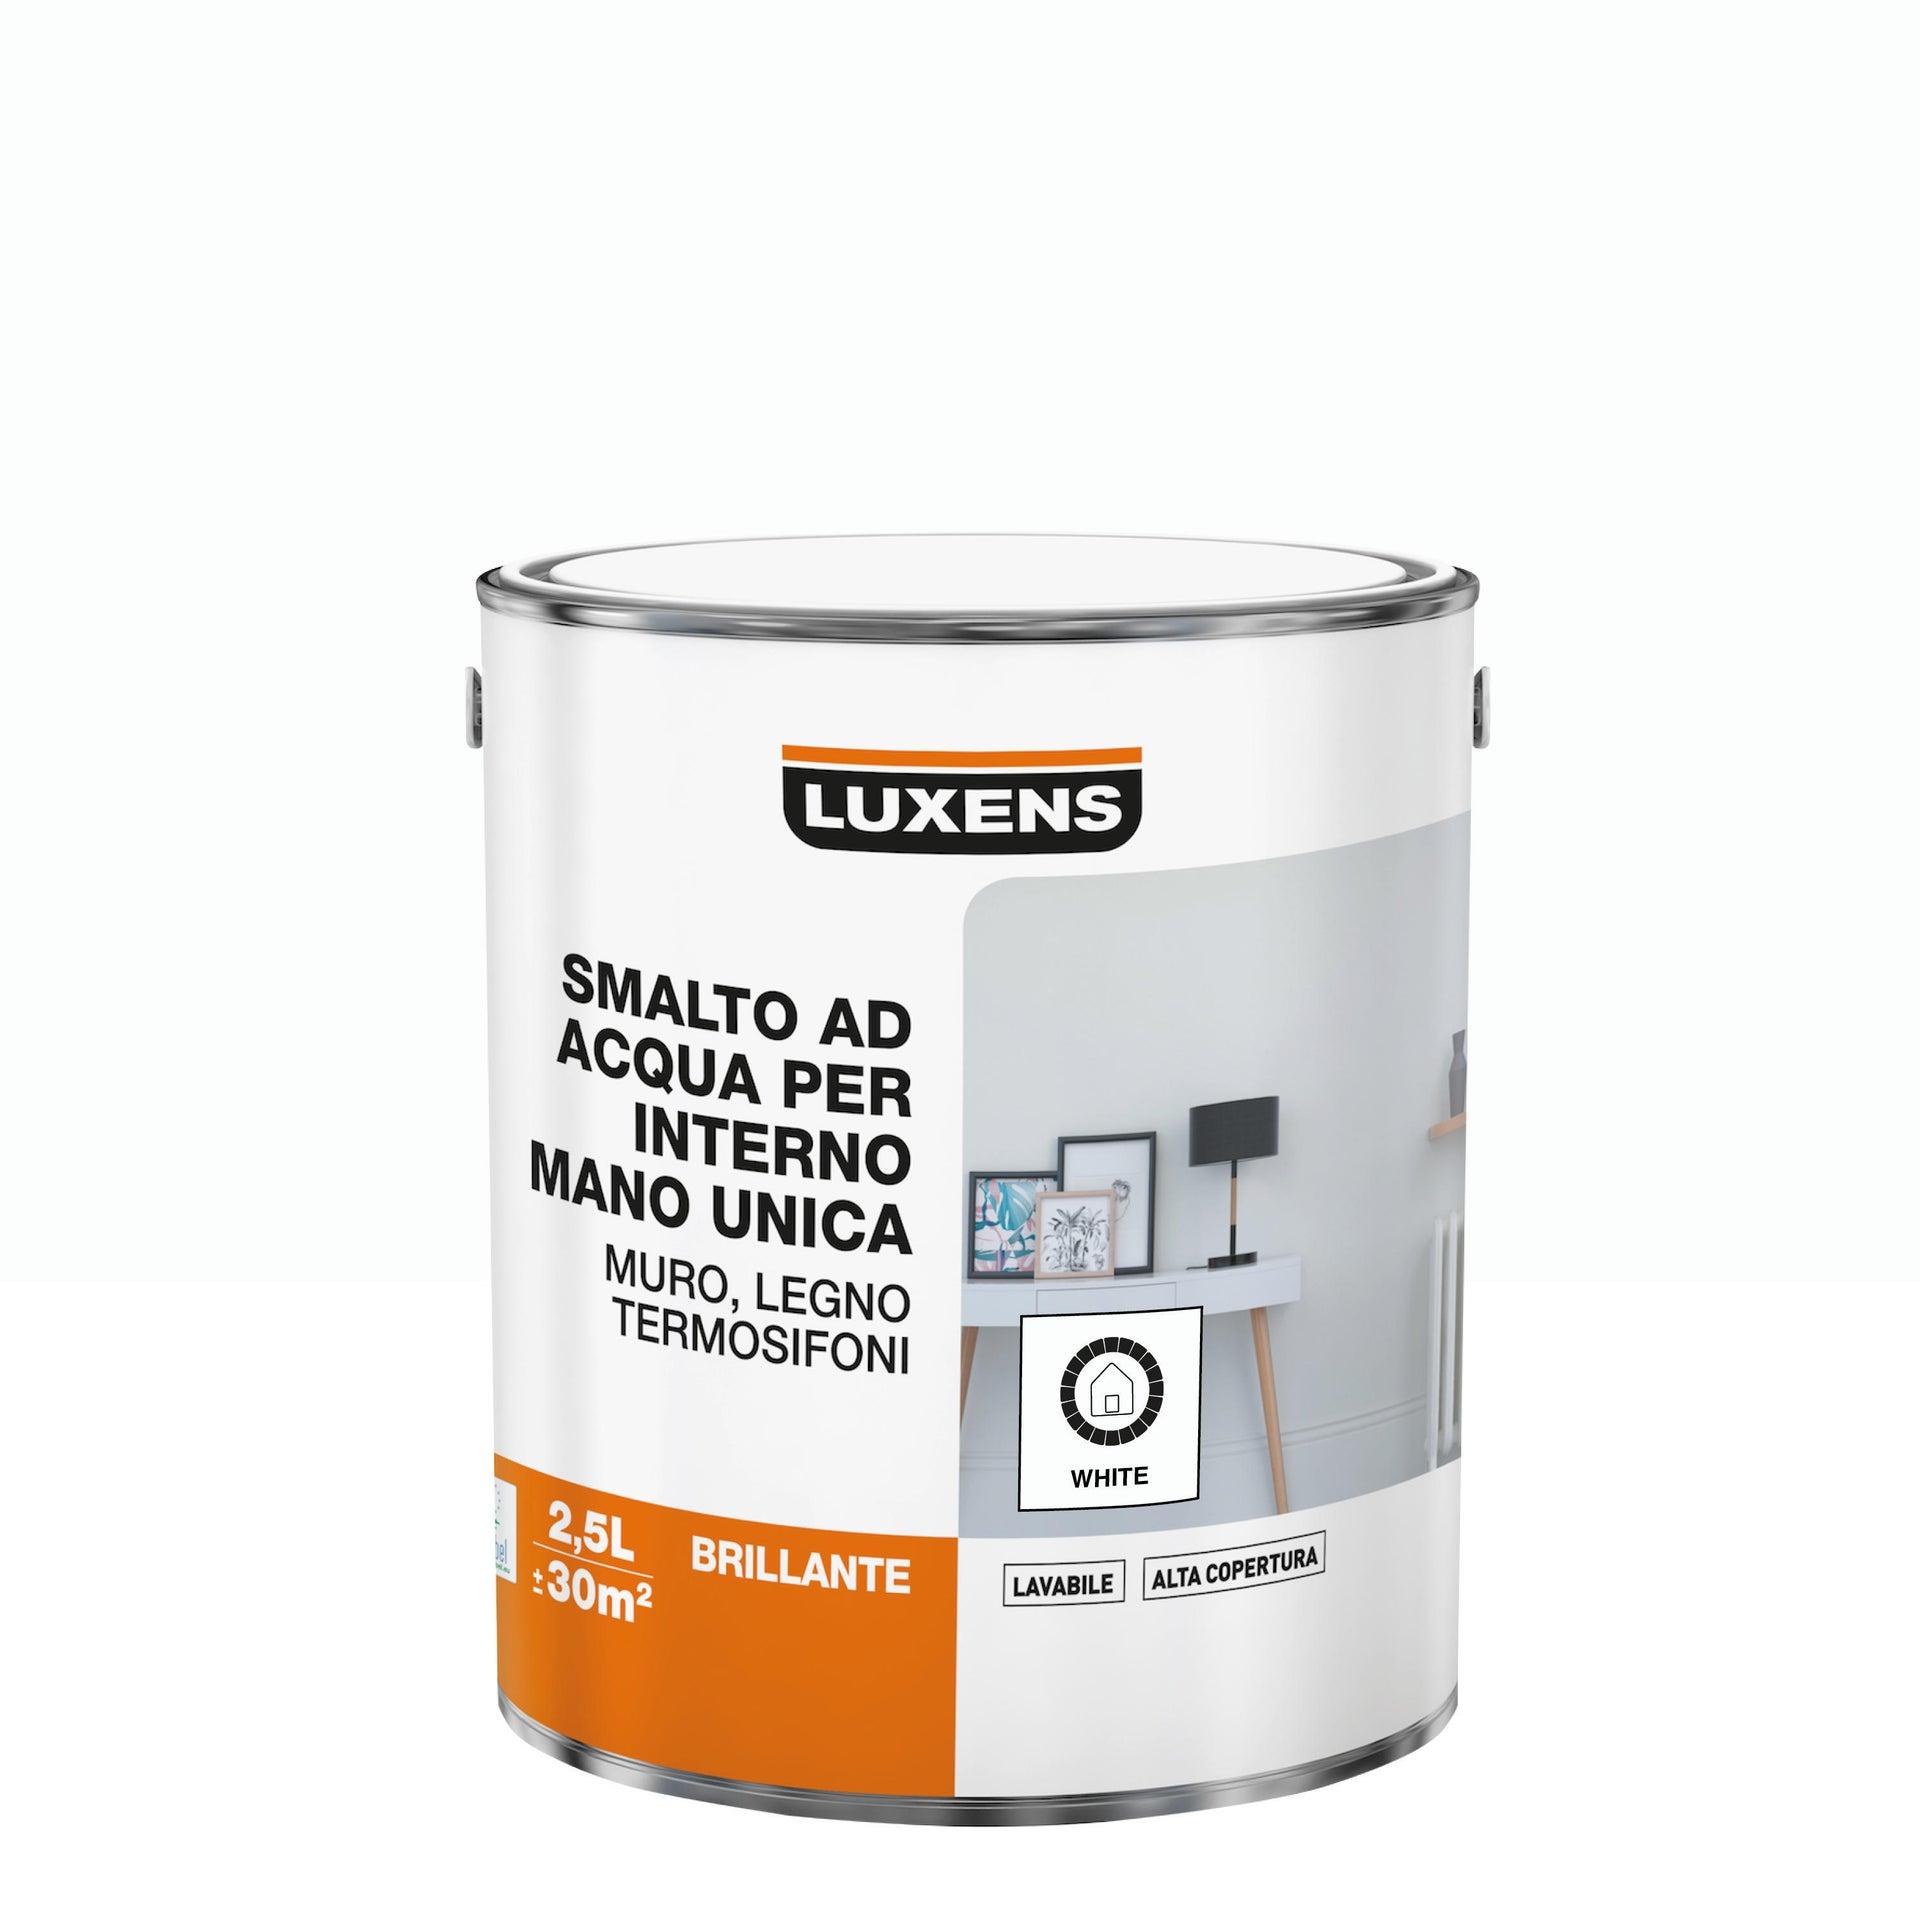 Vernice di finitura LUXENS Manounica base acqua bianco lucido 2.5 L - 3